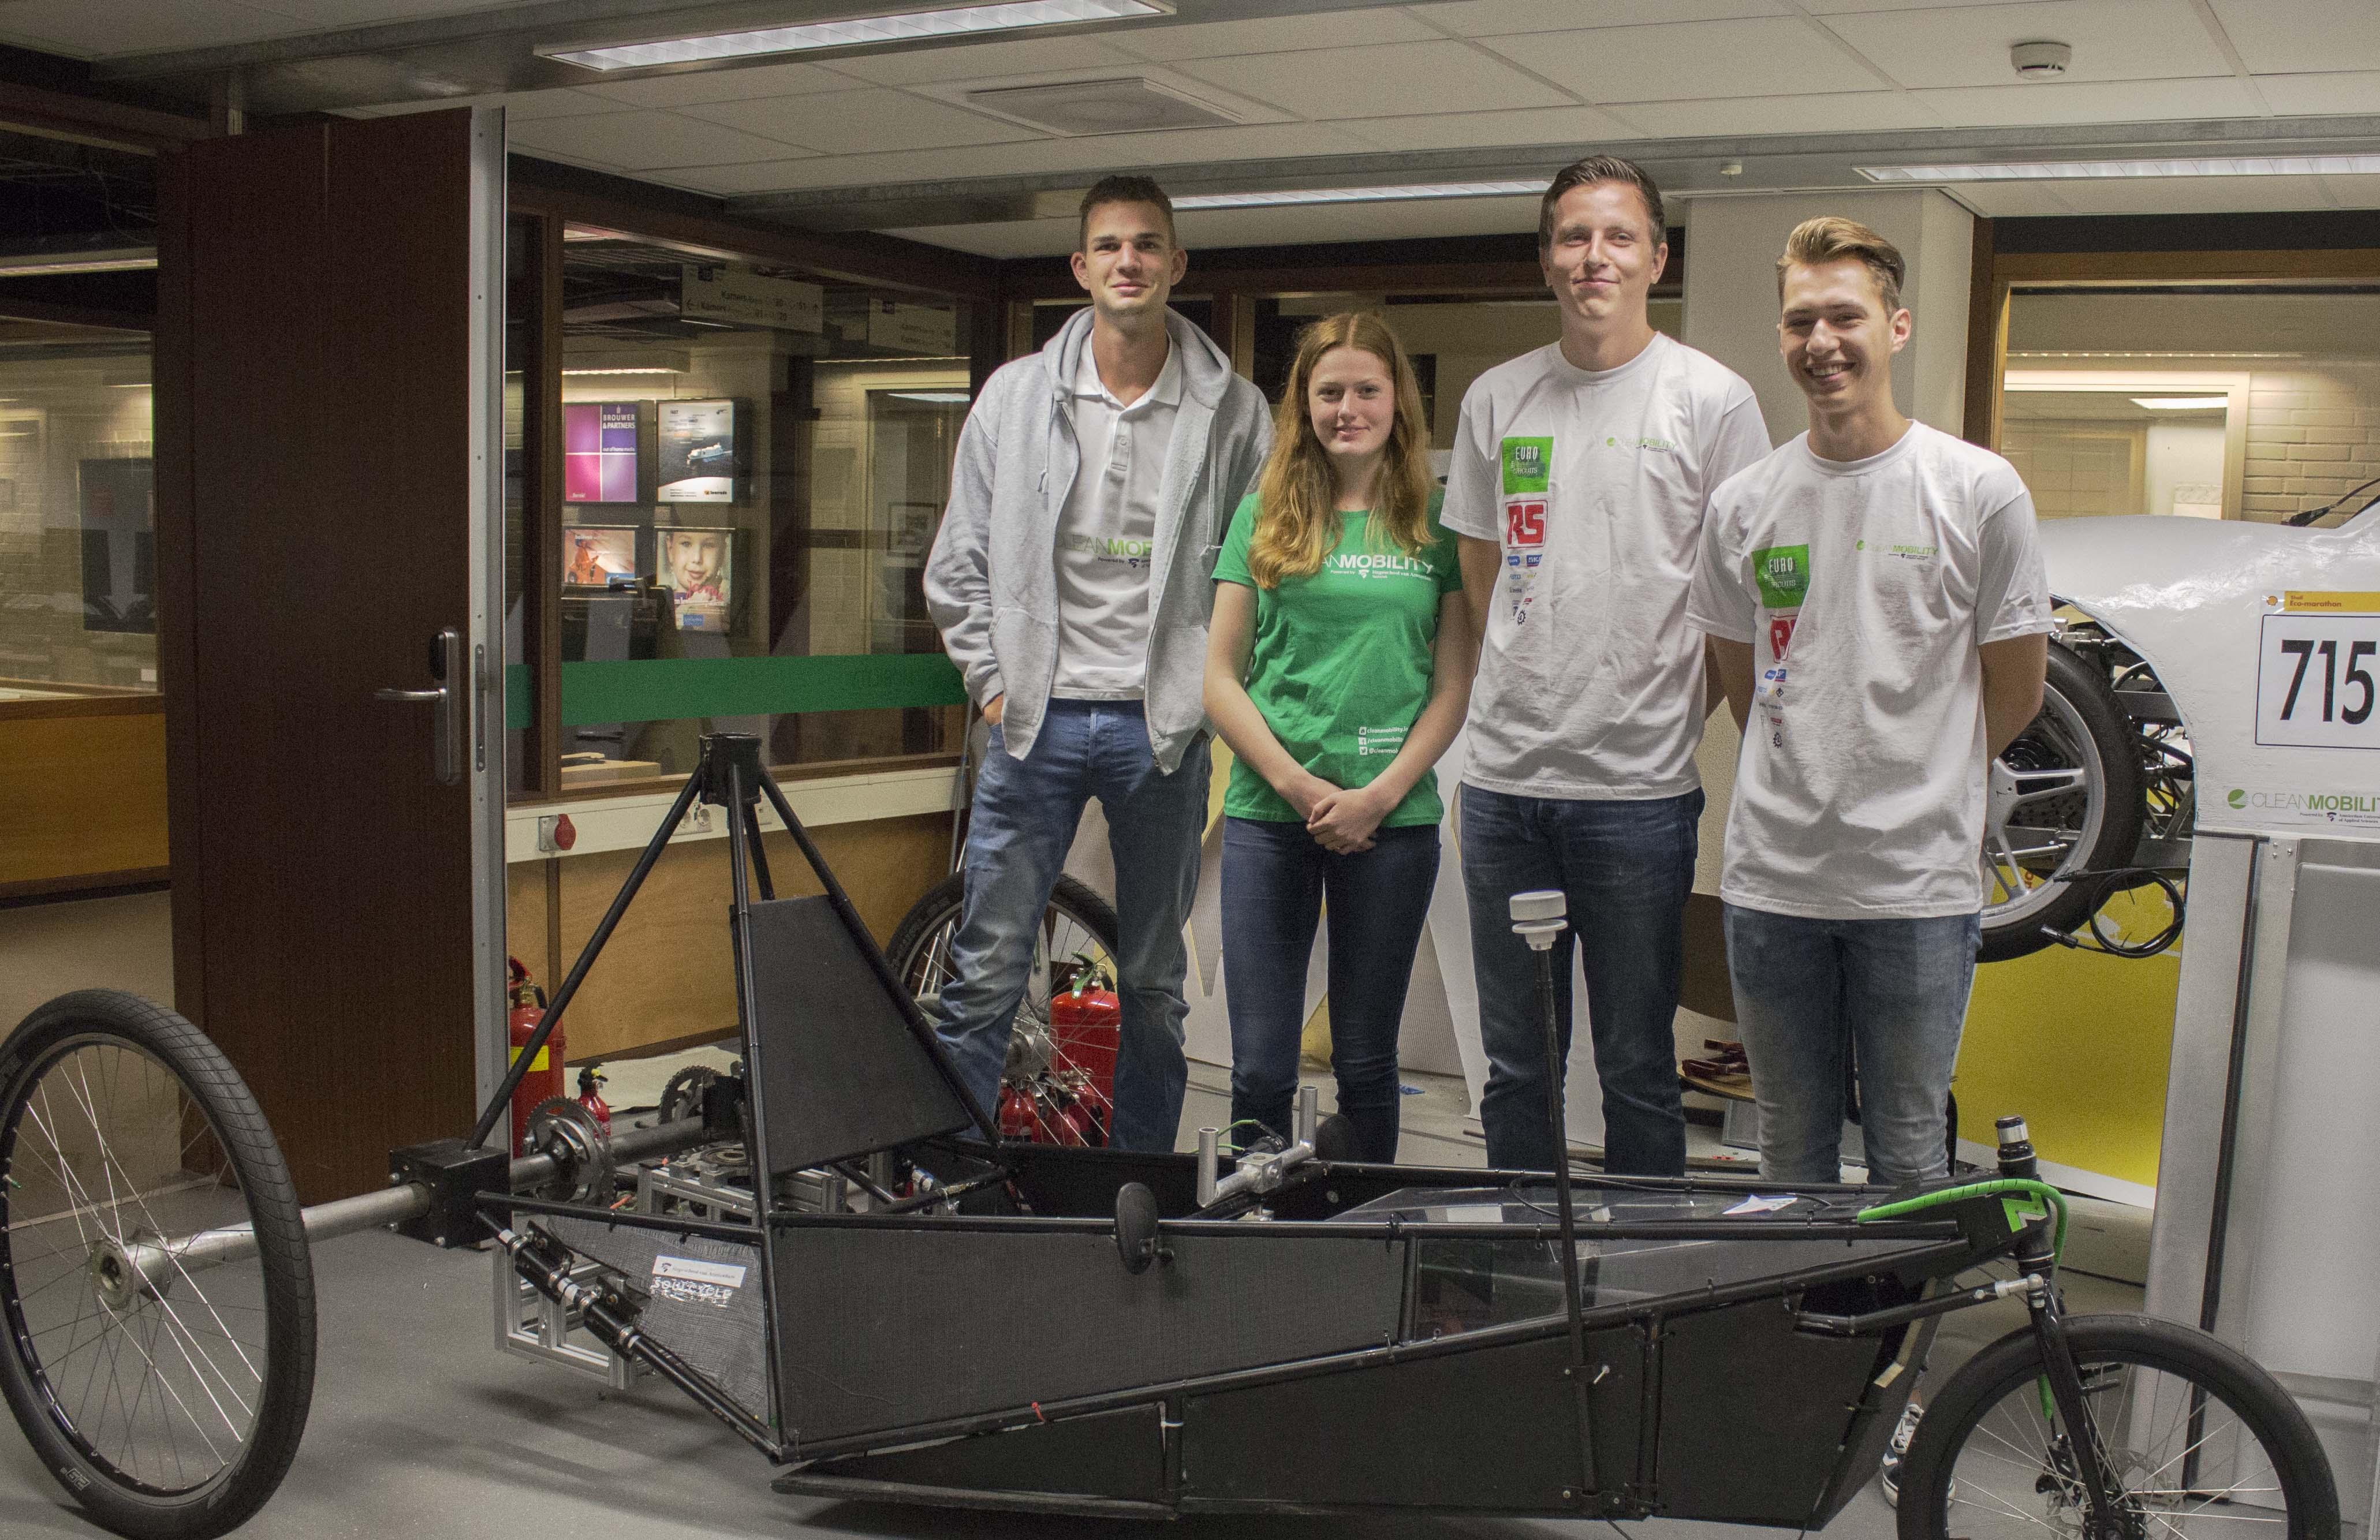 Team-Spirit_Leapfrog-3D-Printers_Clean-Mobility_Testimonial